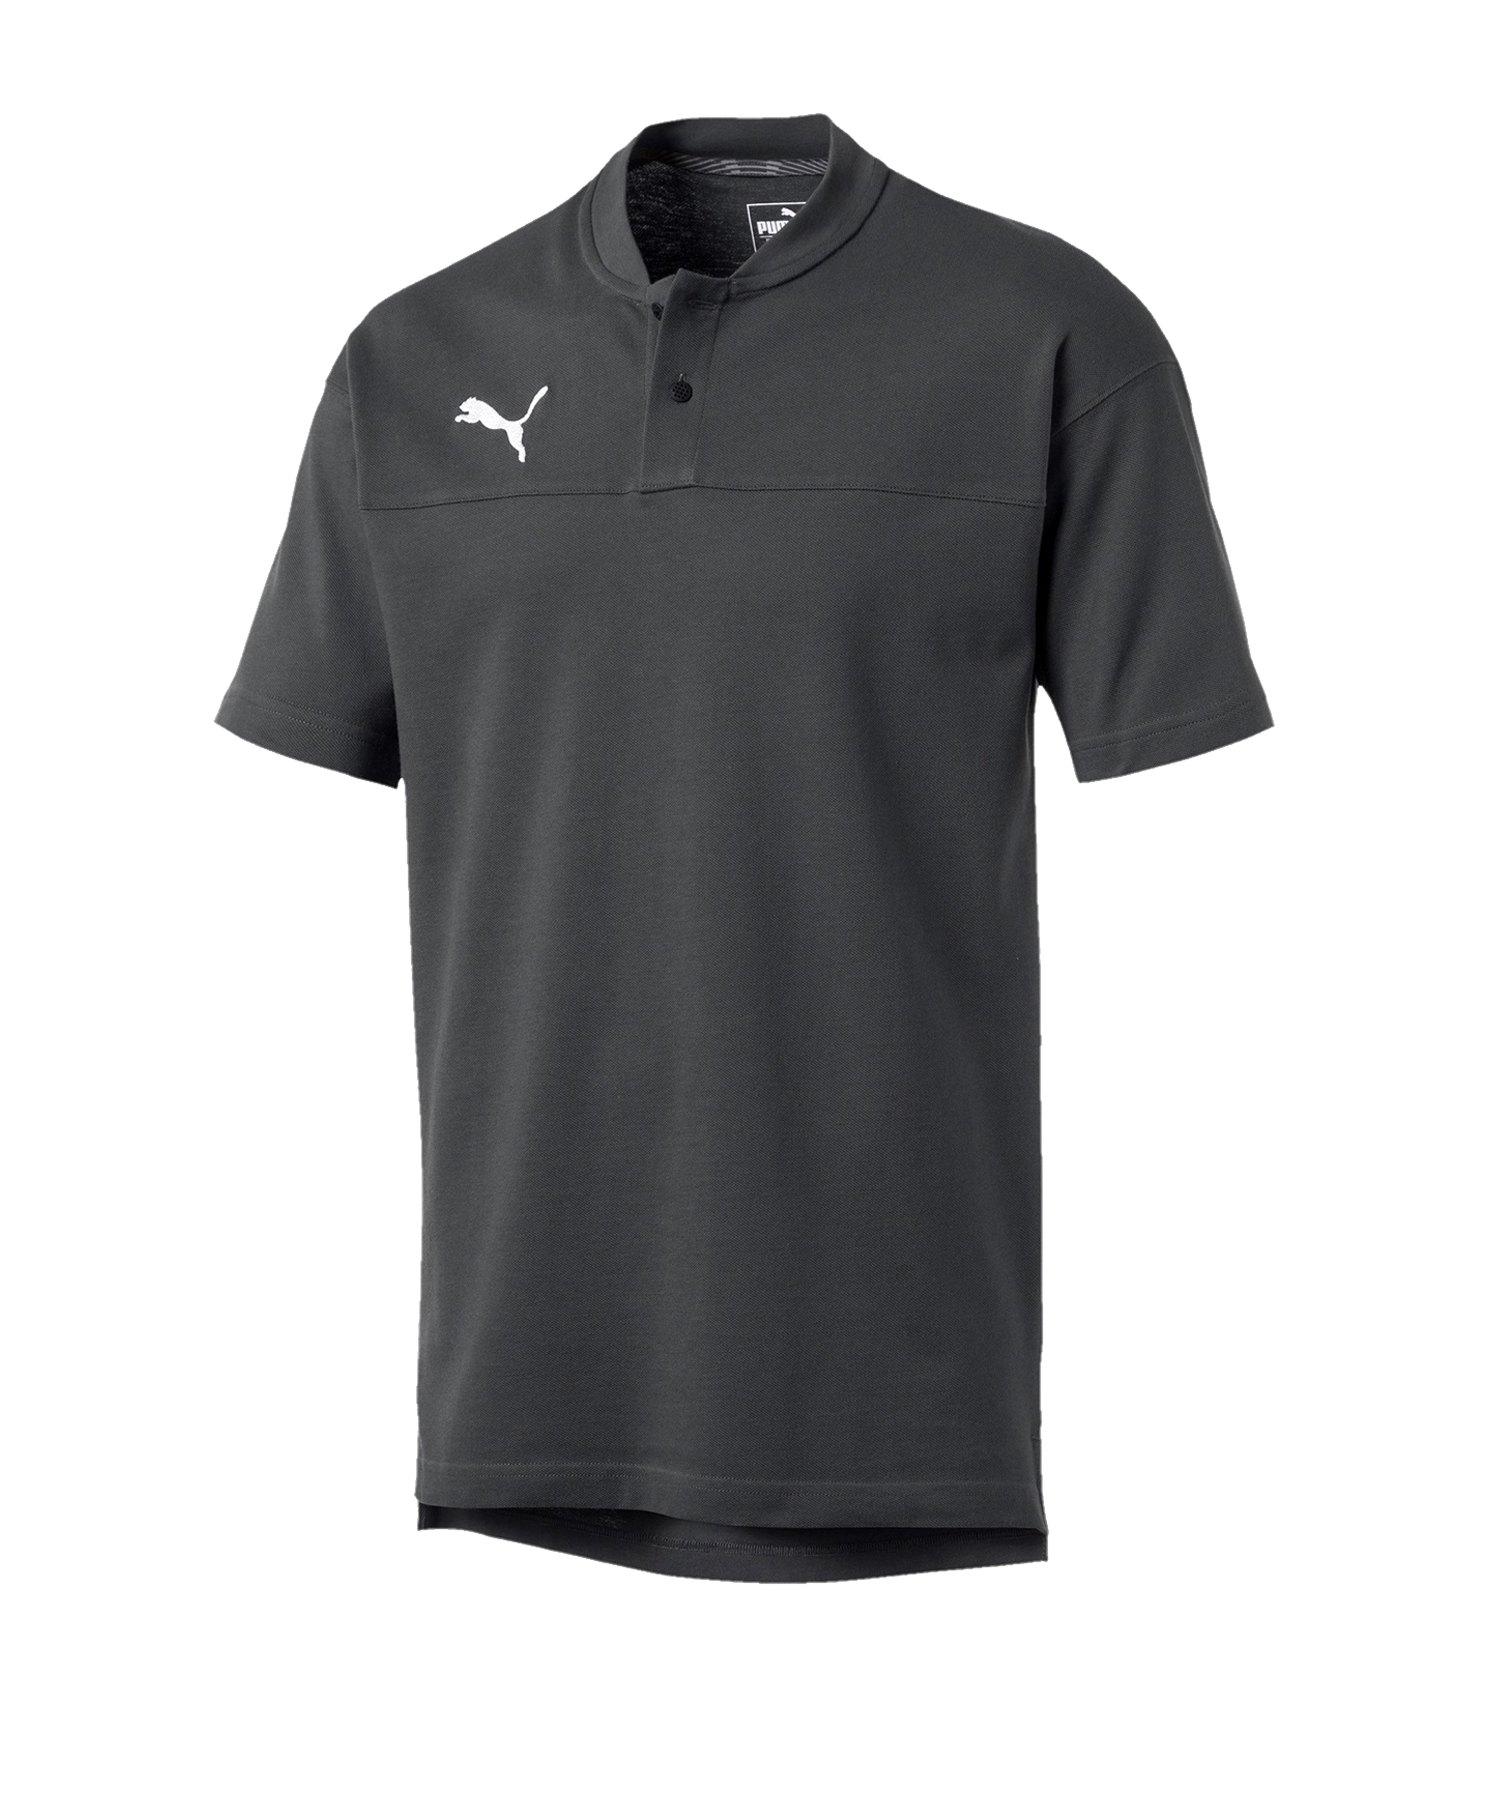 PUMA CUP Casual Poloshirt Grau F037 - grau